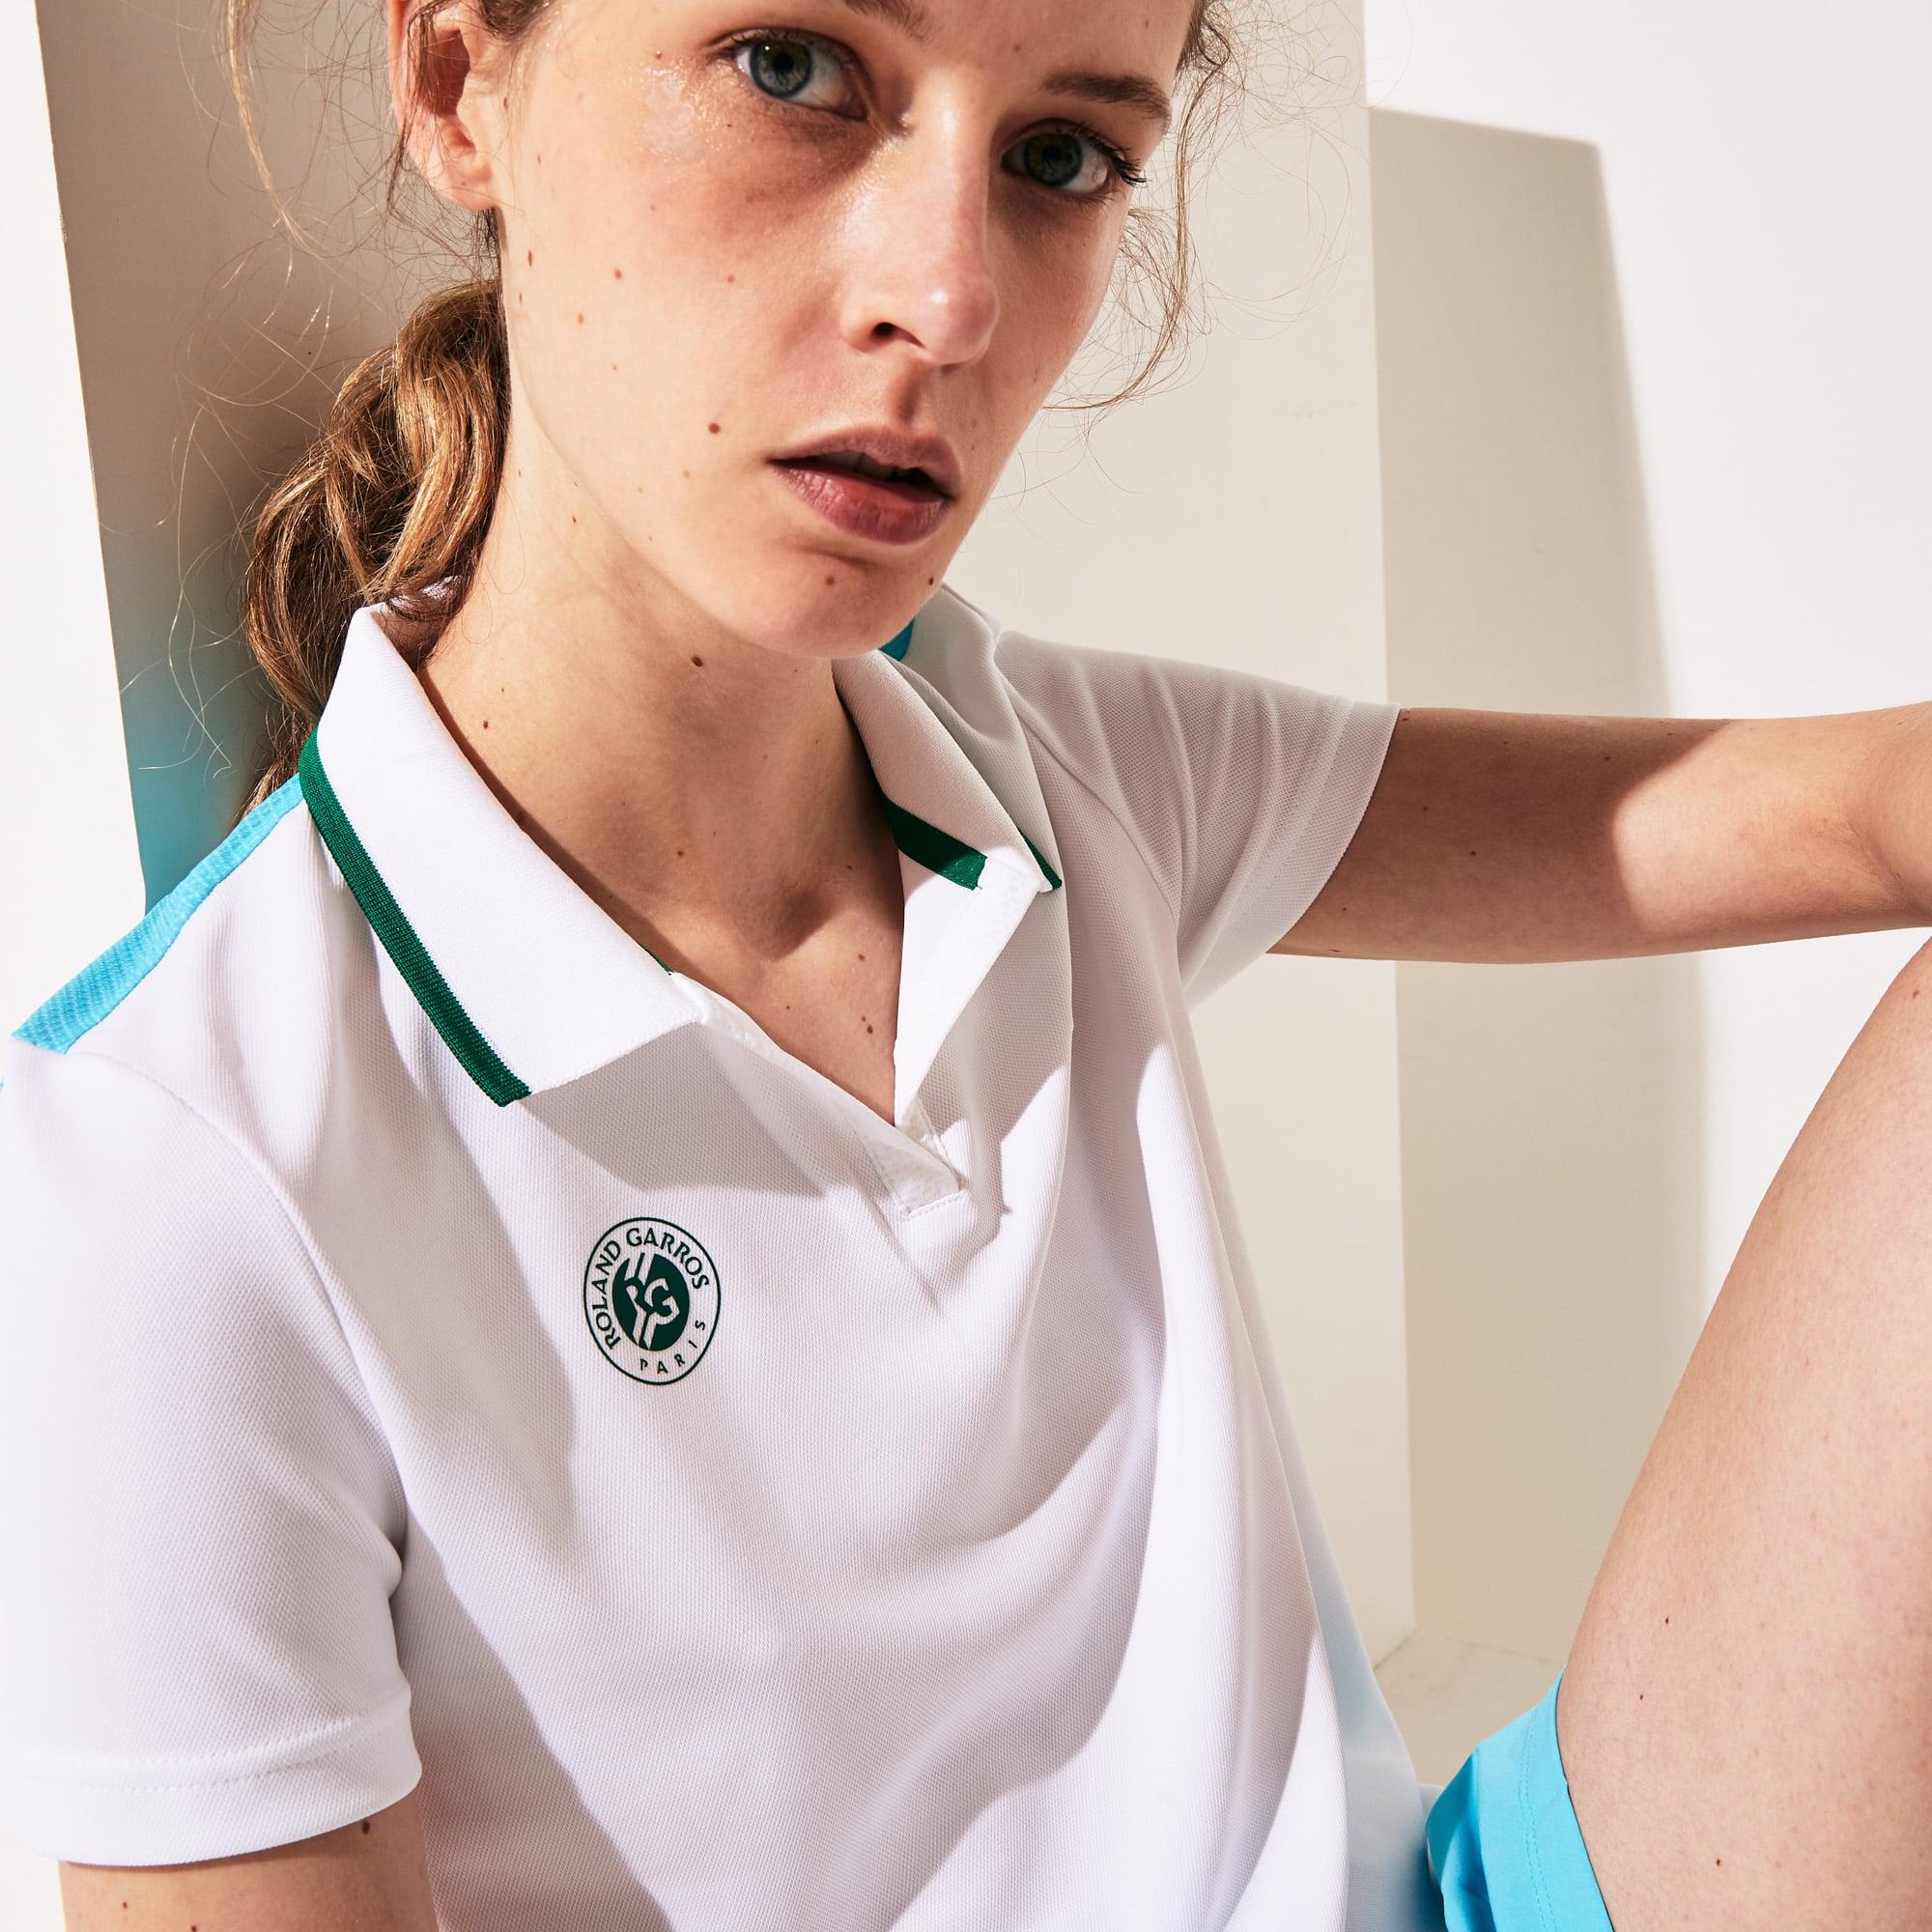 Lacoste Womens SPORT Roland Garros Breathable Bimaterial Polo Shirt